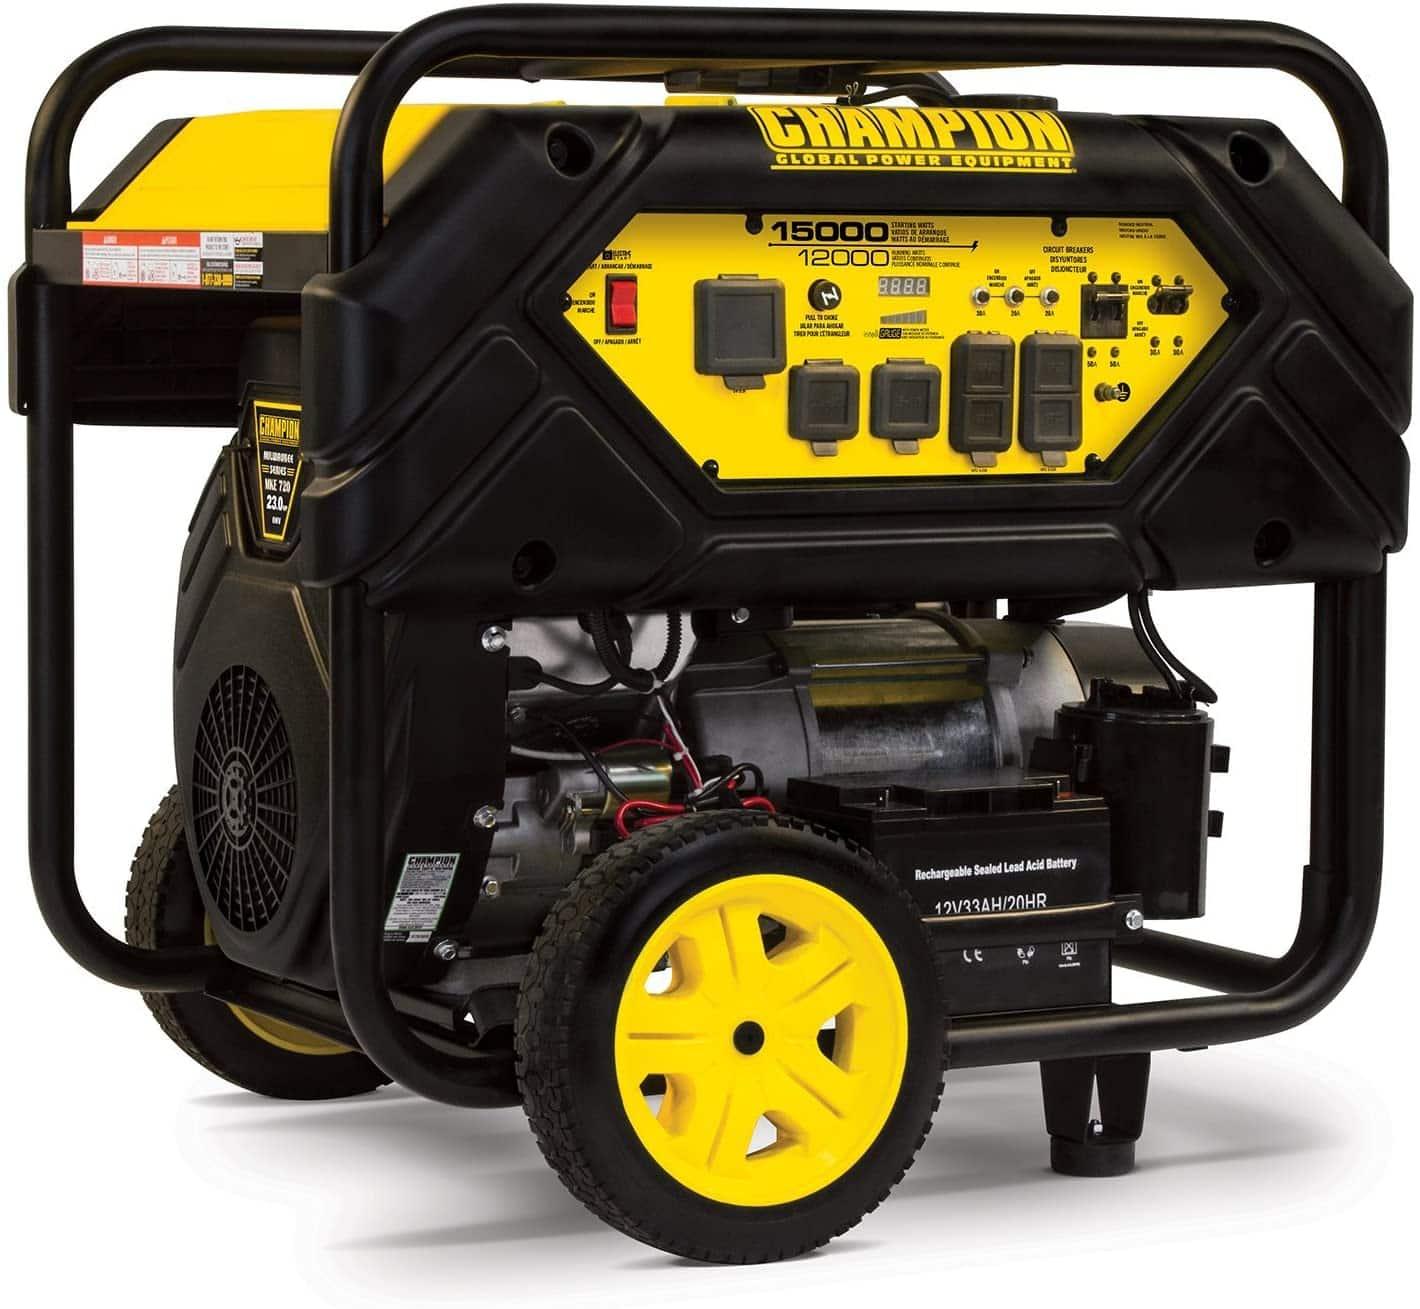 Champion 12,000-Watt Electric Start Portable Generator